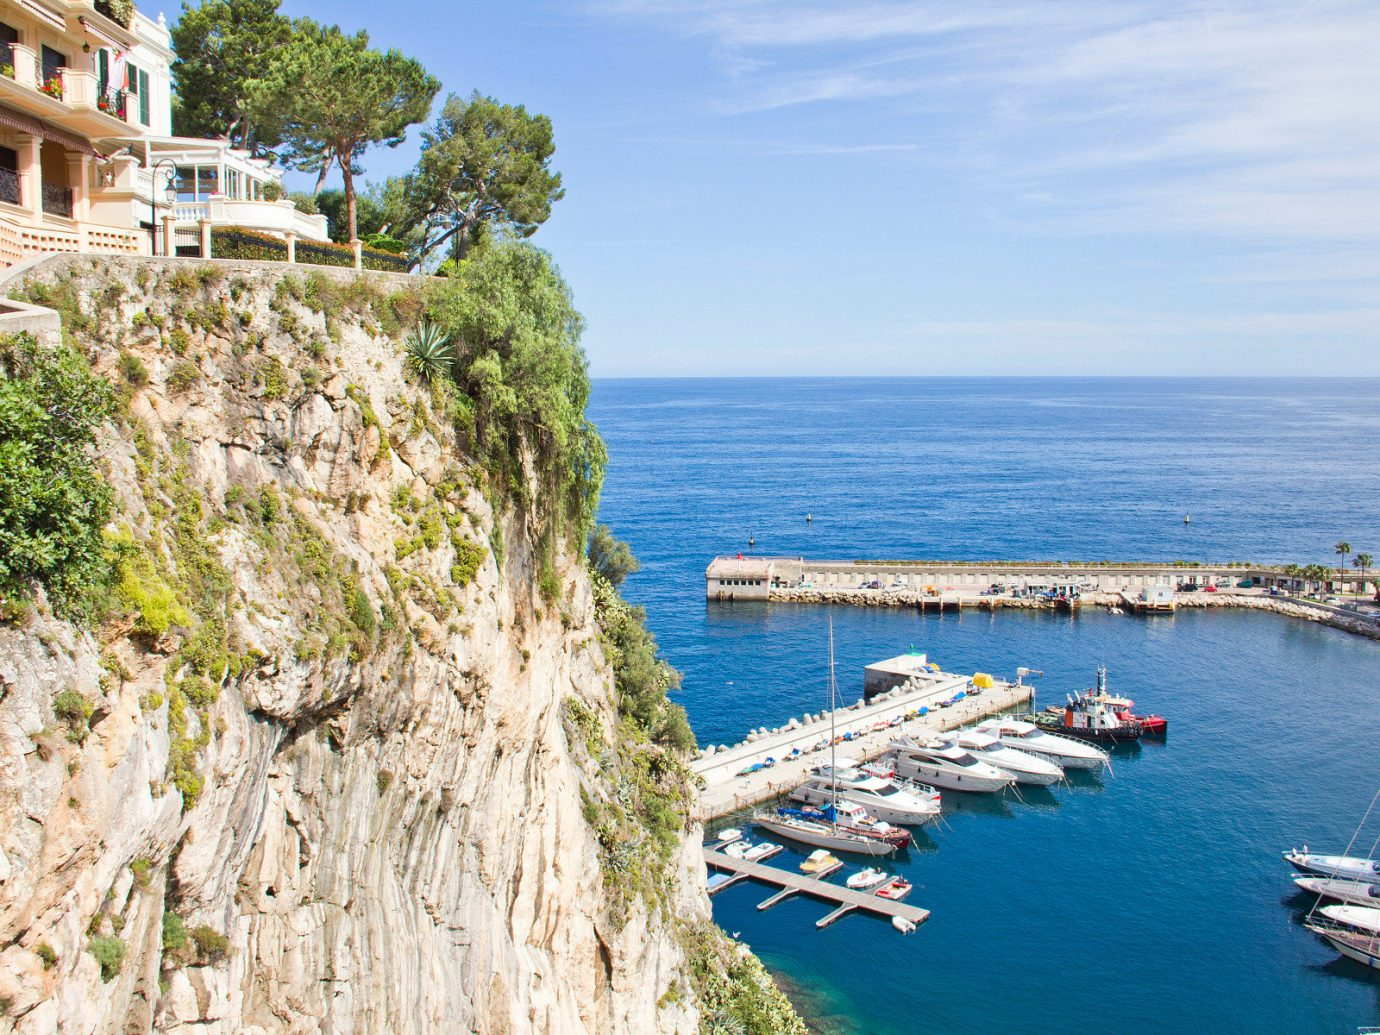 Travel Tips water outdoor sky Boat Coast Sea vacation cliff bay vehicle terrain cape waterway cove overlooking